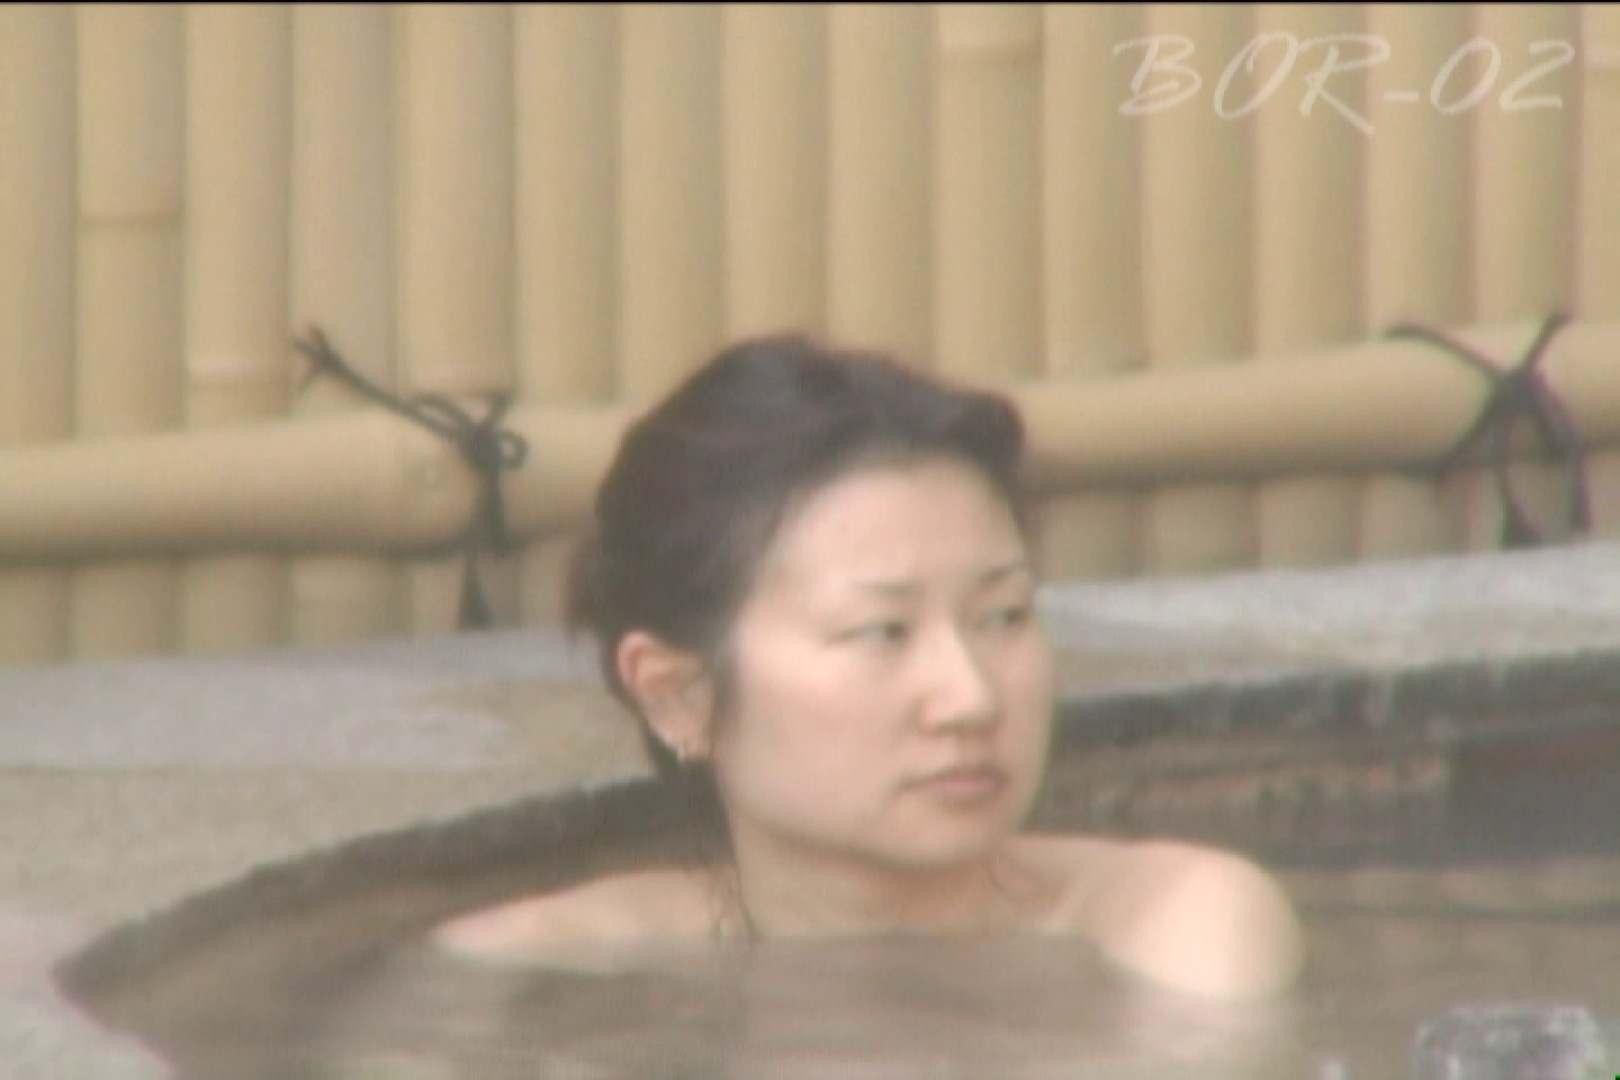 Aquaな露天風呂Vol.477 盗撮  79連発 3